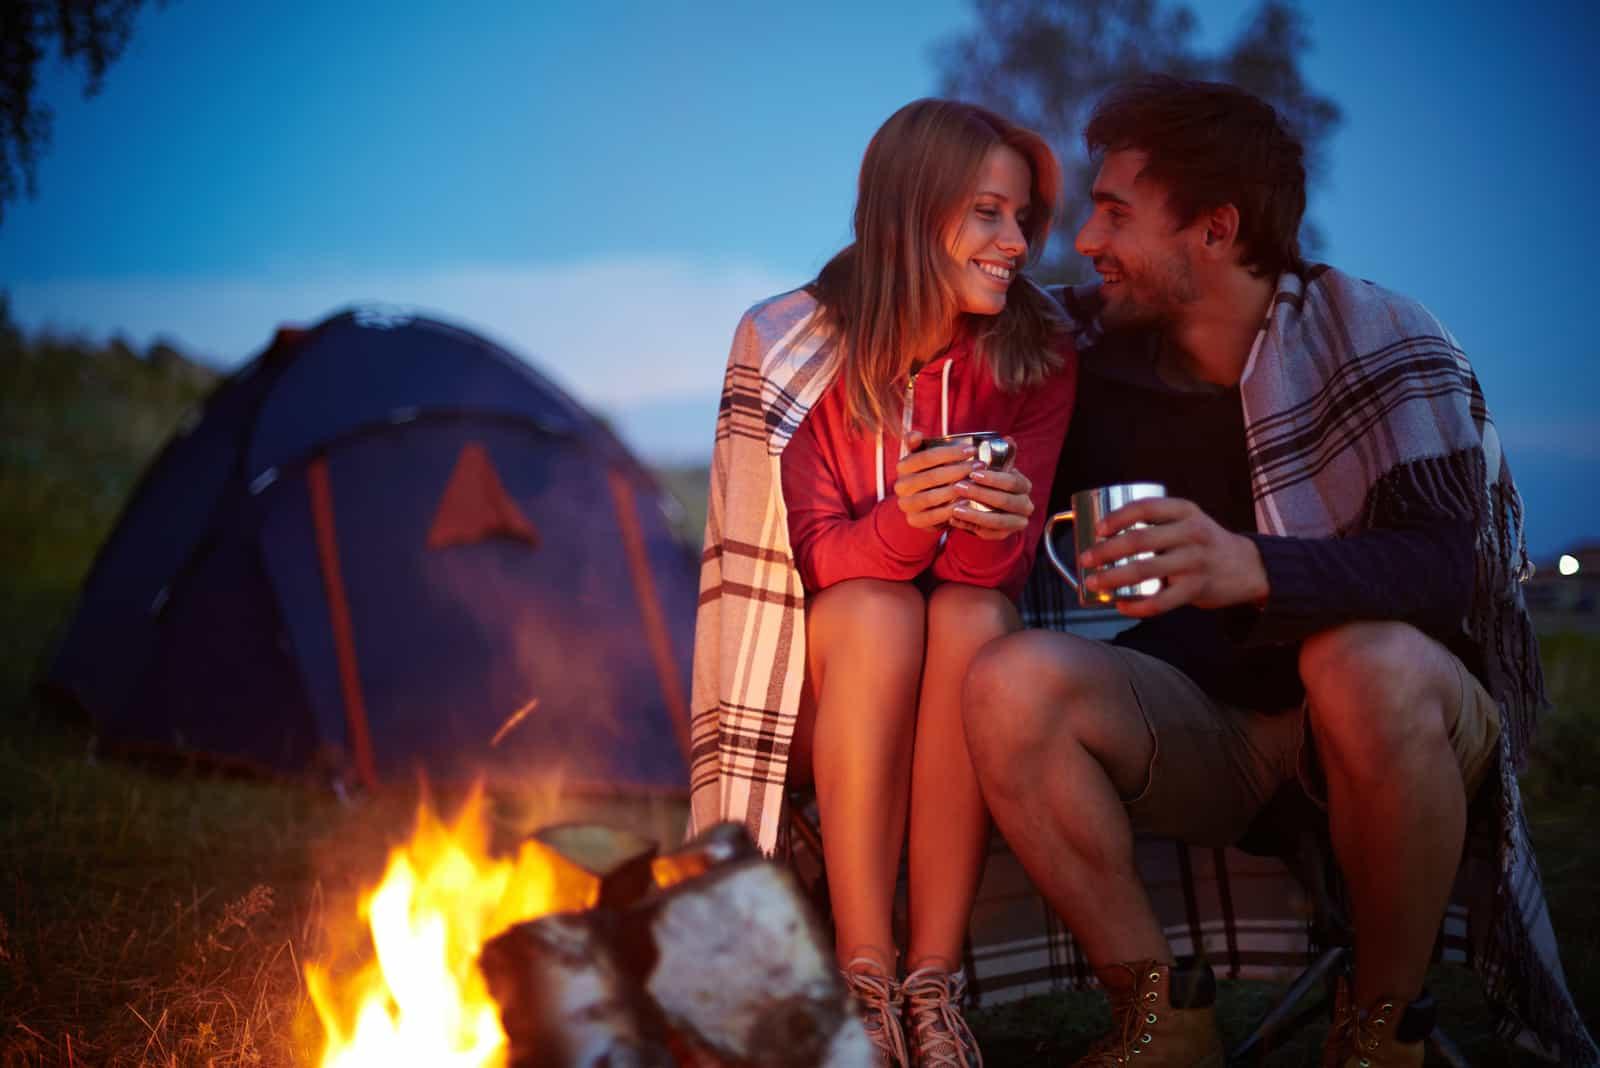 Paar Camping, am Feuer sitzen